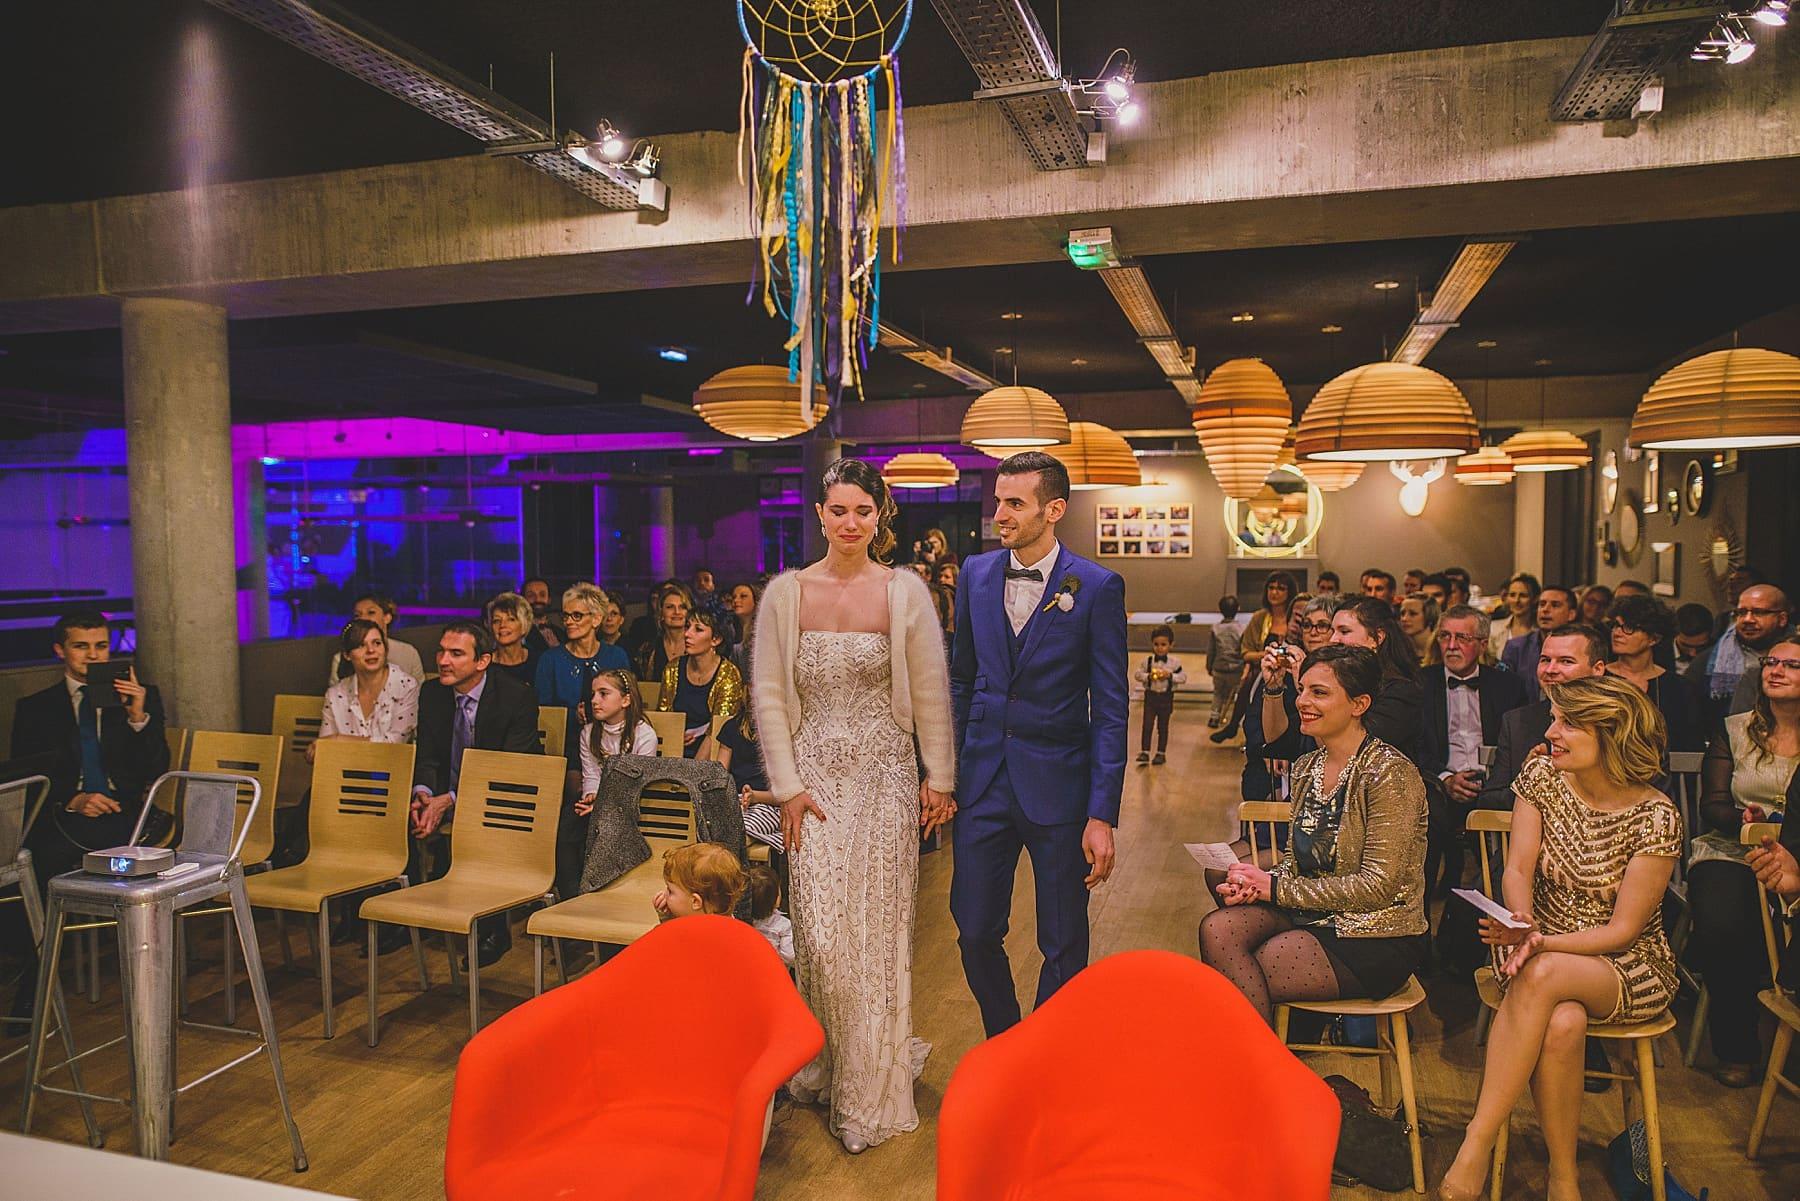 paris wedding photographer,destination wedding,irish elopement photographer,city bridal style,mamie cocotte wedding,intimate ceremony,navyblur,ireland wedding photographer,